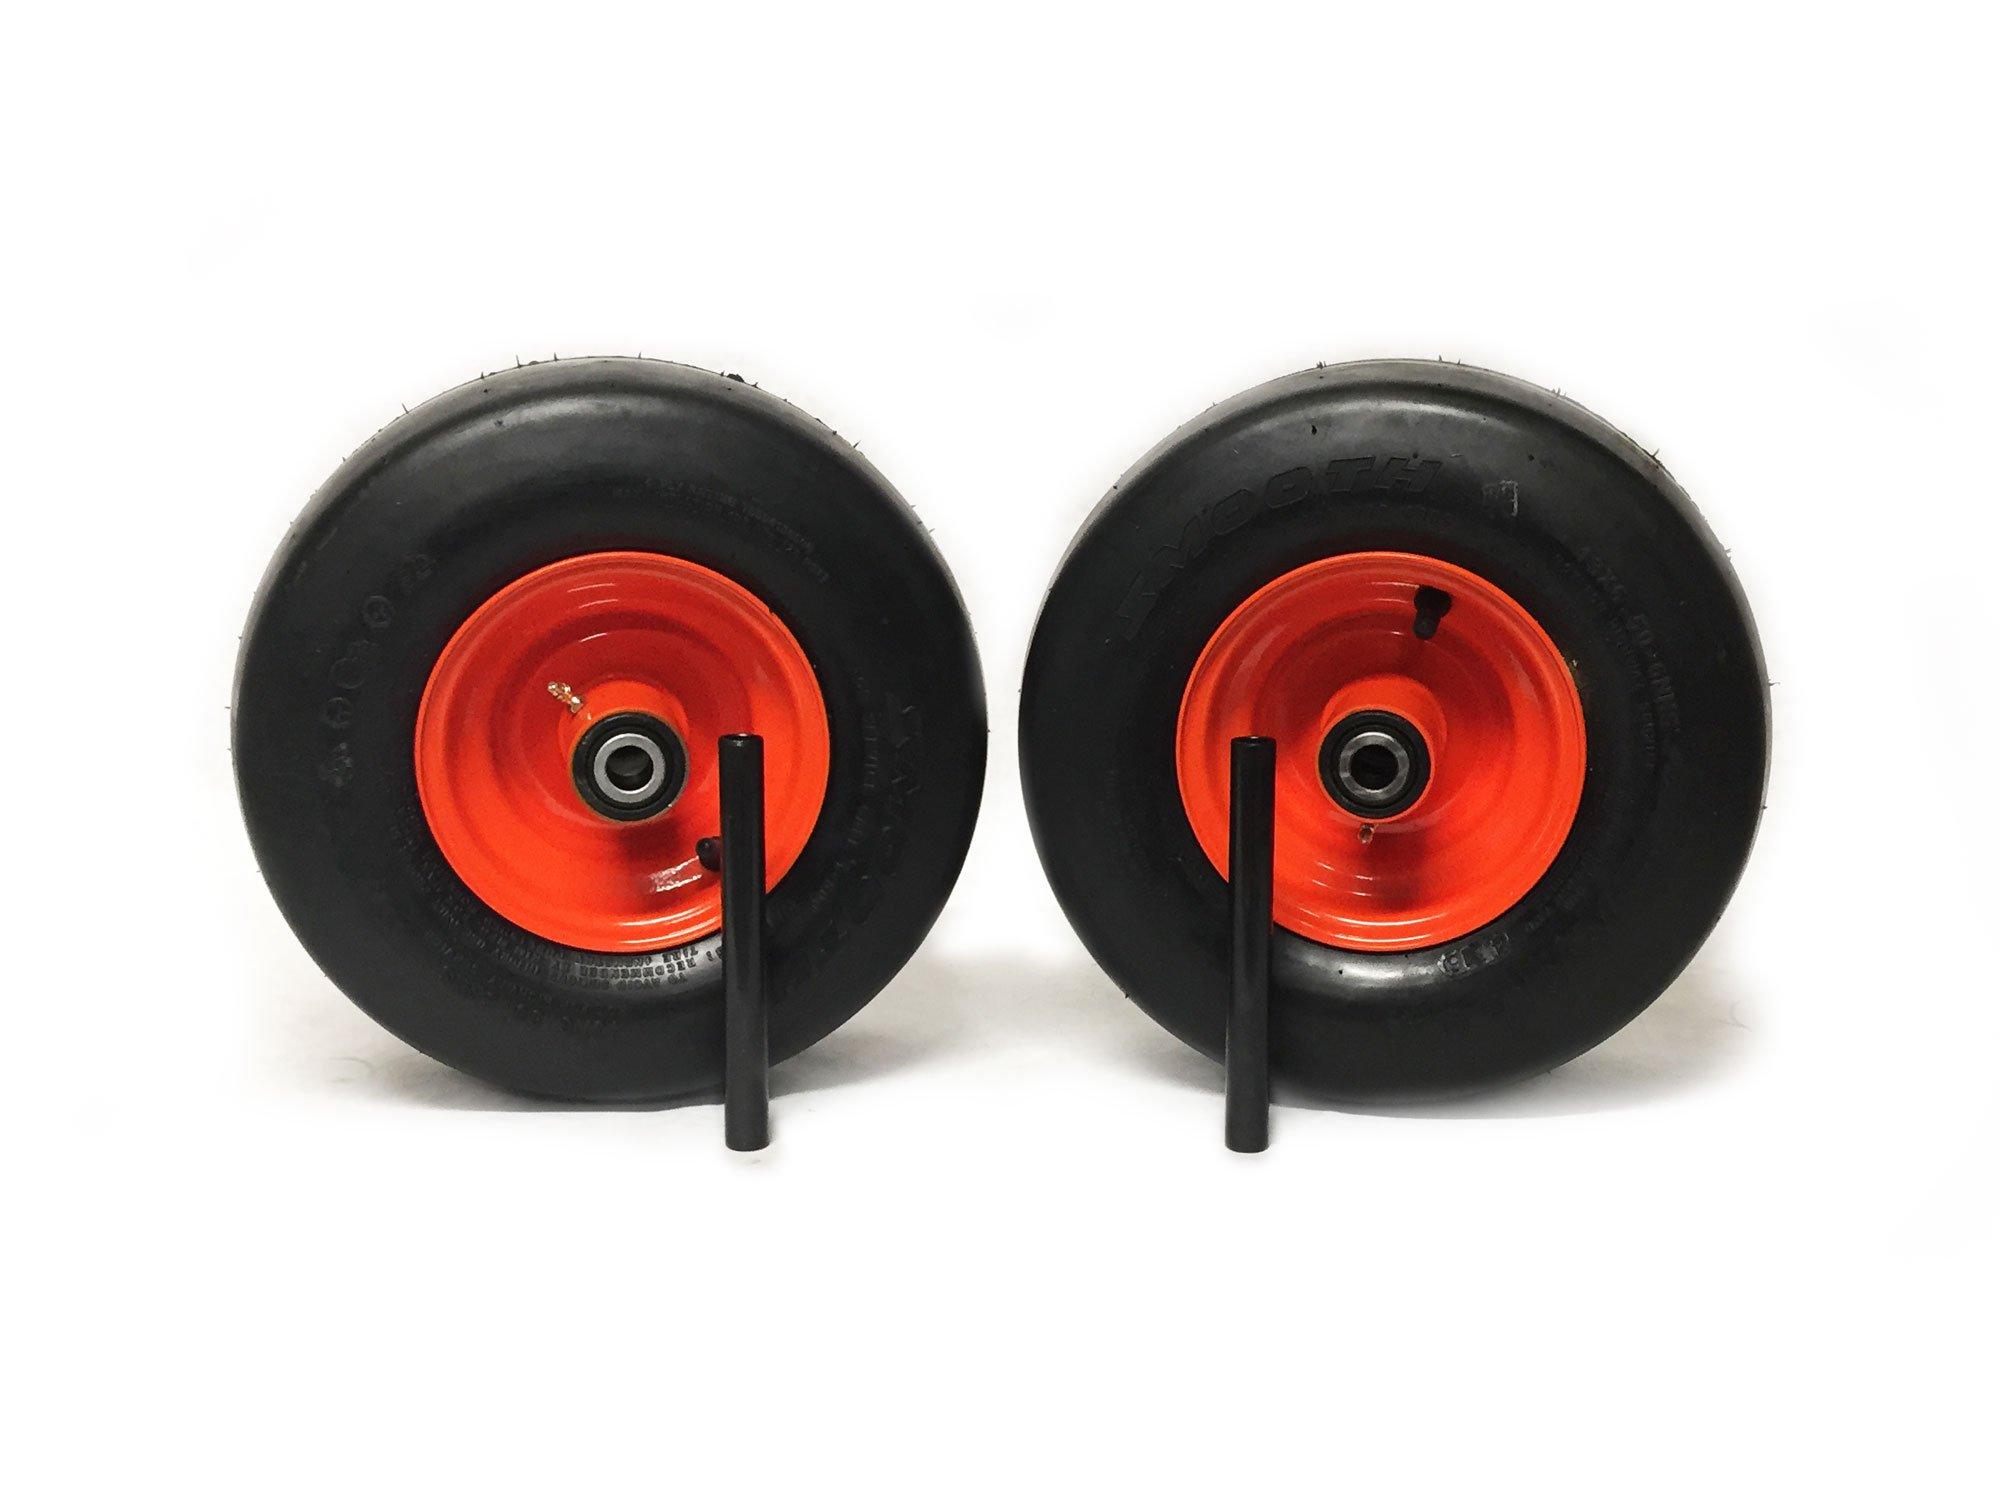 (2) Kubota Pneumatic Tire Assemblies 15x6.00-6 Fits ZD321, ZD323, ZD326, ZD331, ZG327, ZG 332 Replaces K3181-18032